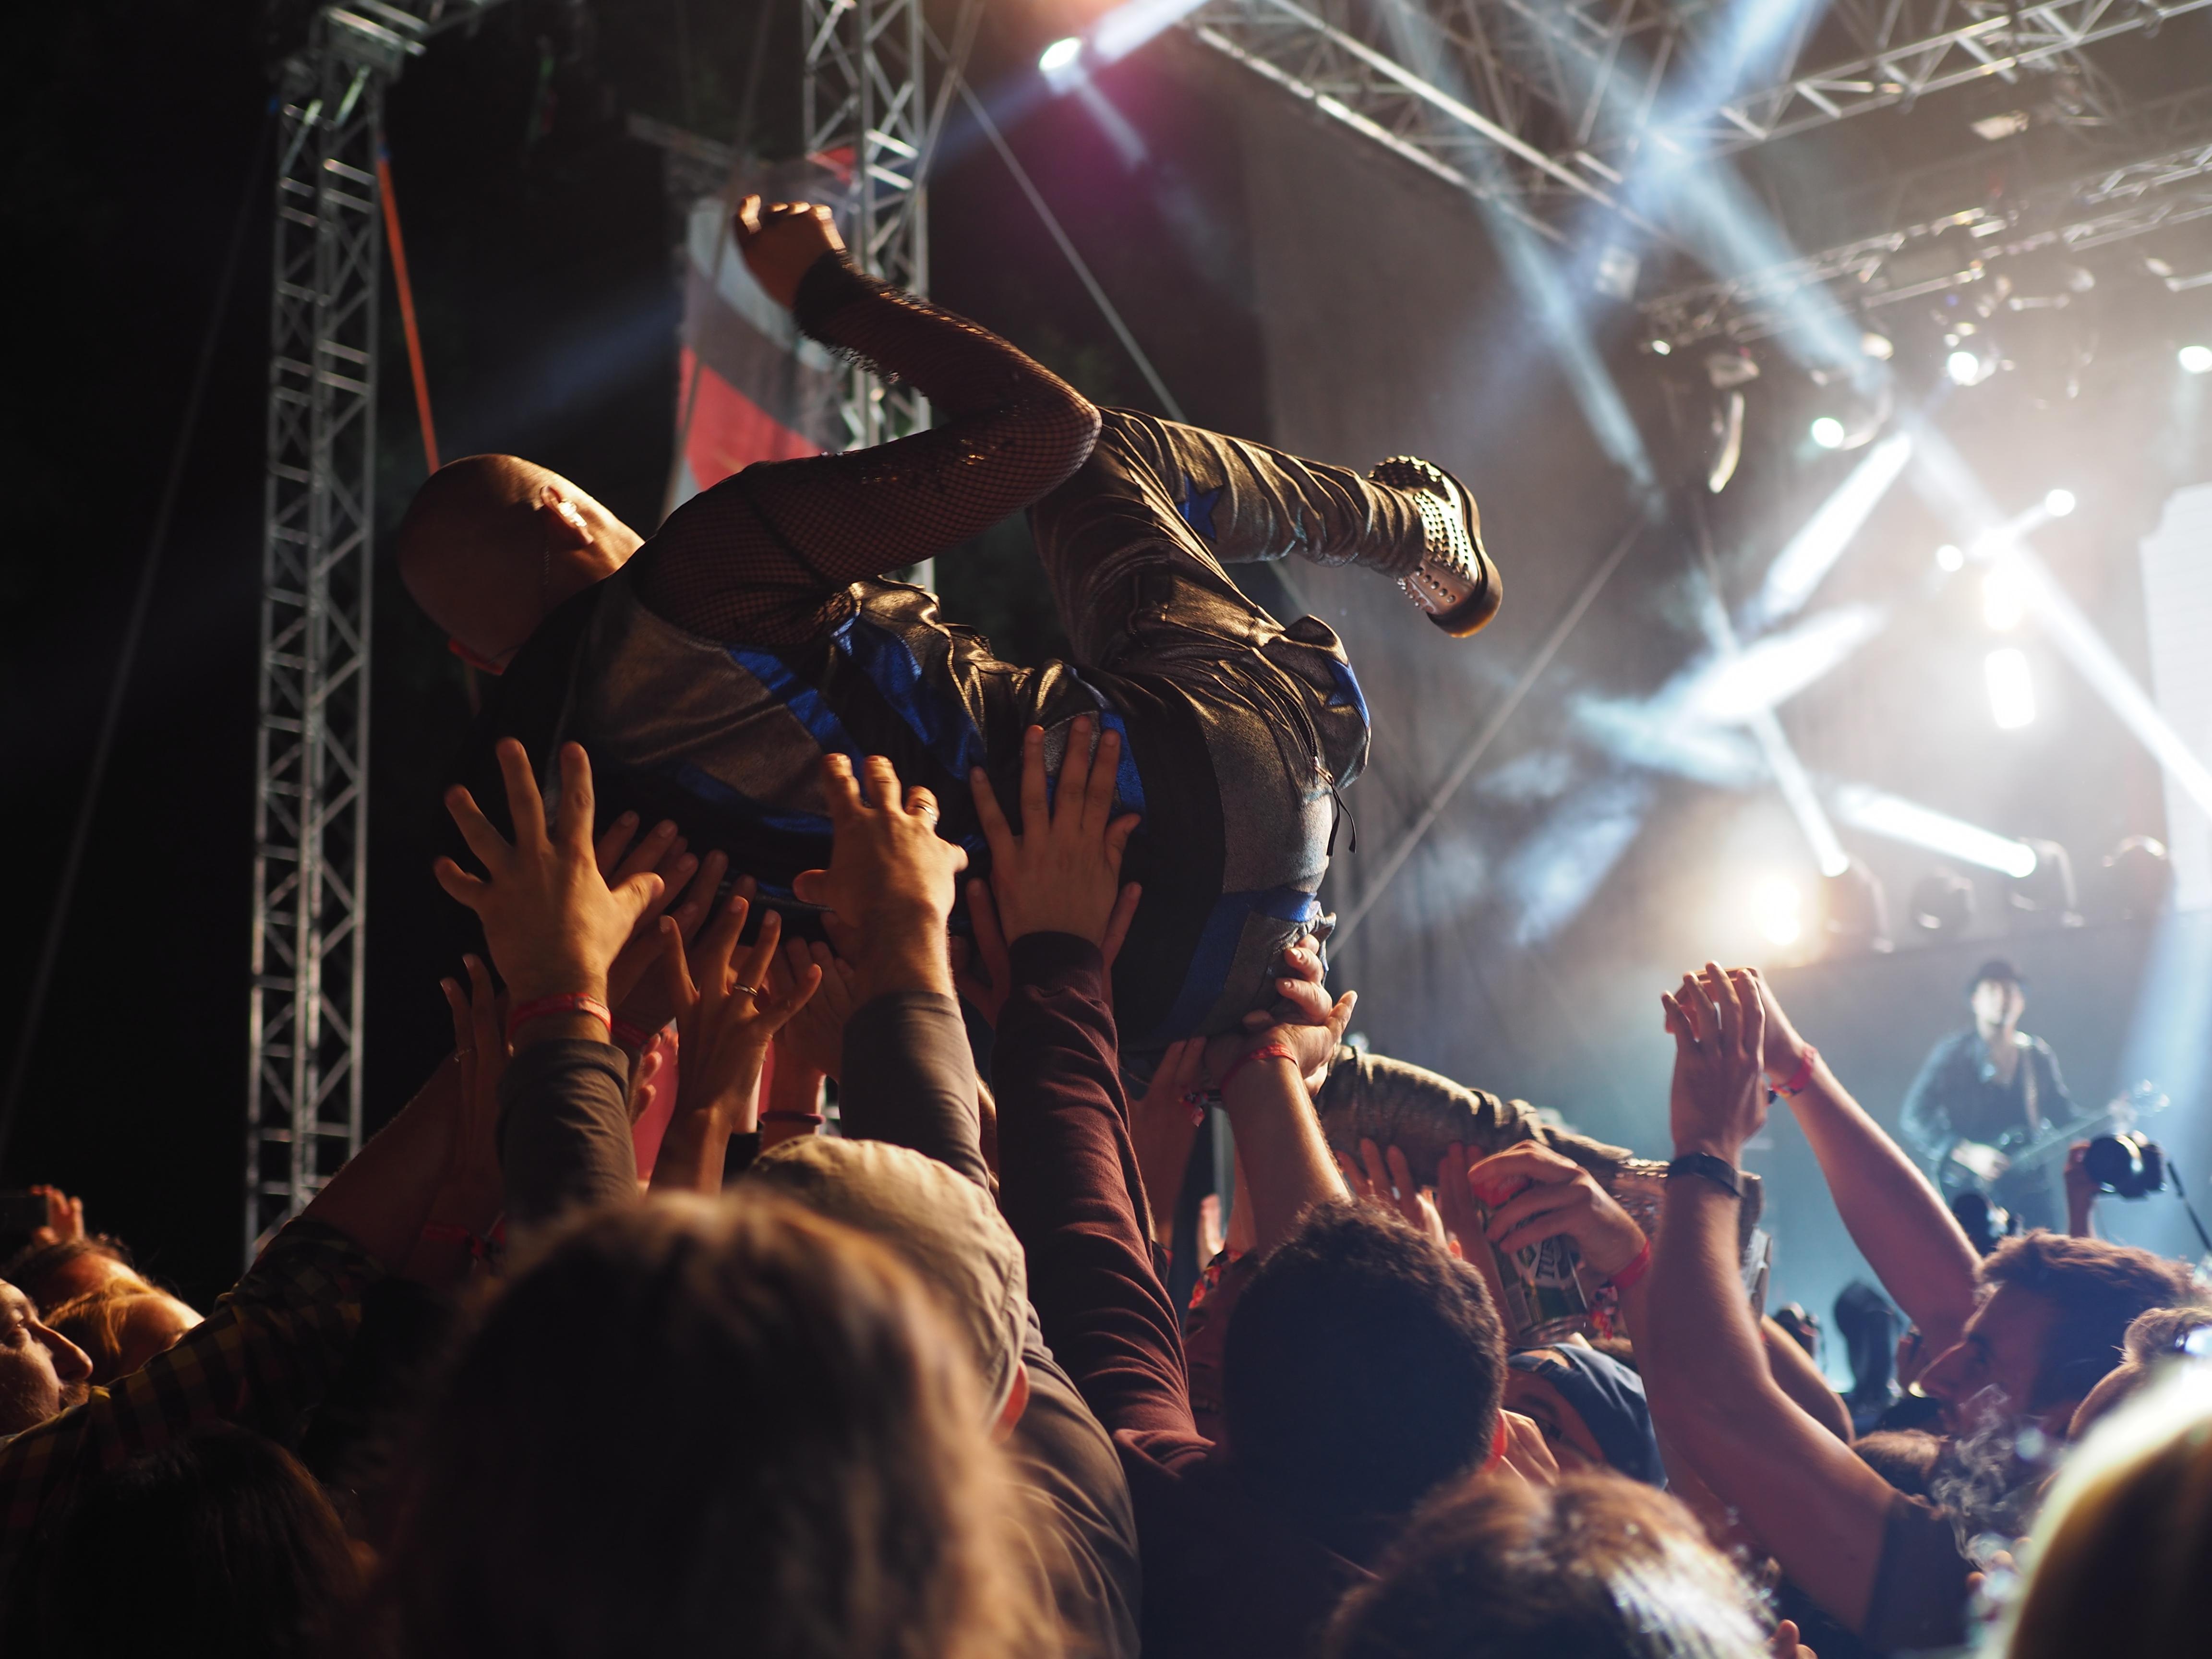 Fotos gratis : música, grupo, gente, multitud, celebracion, cantante ...